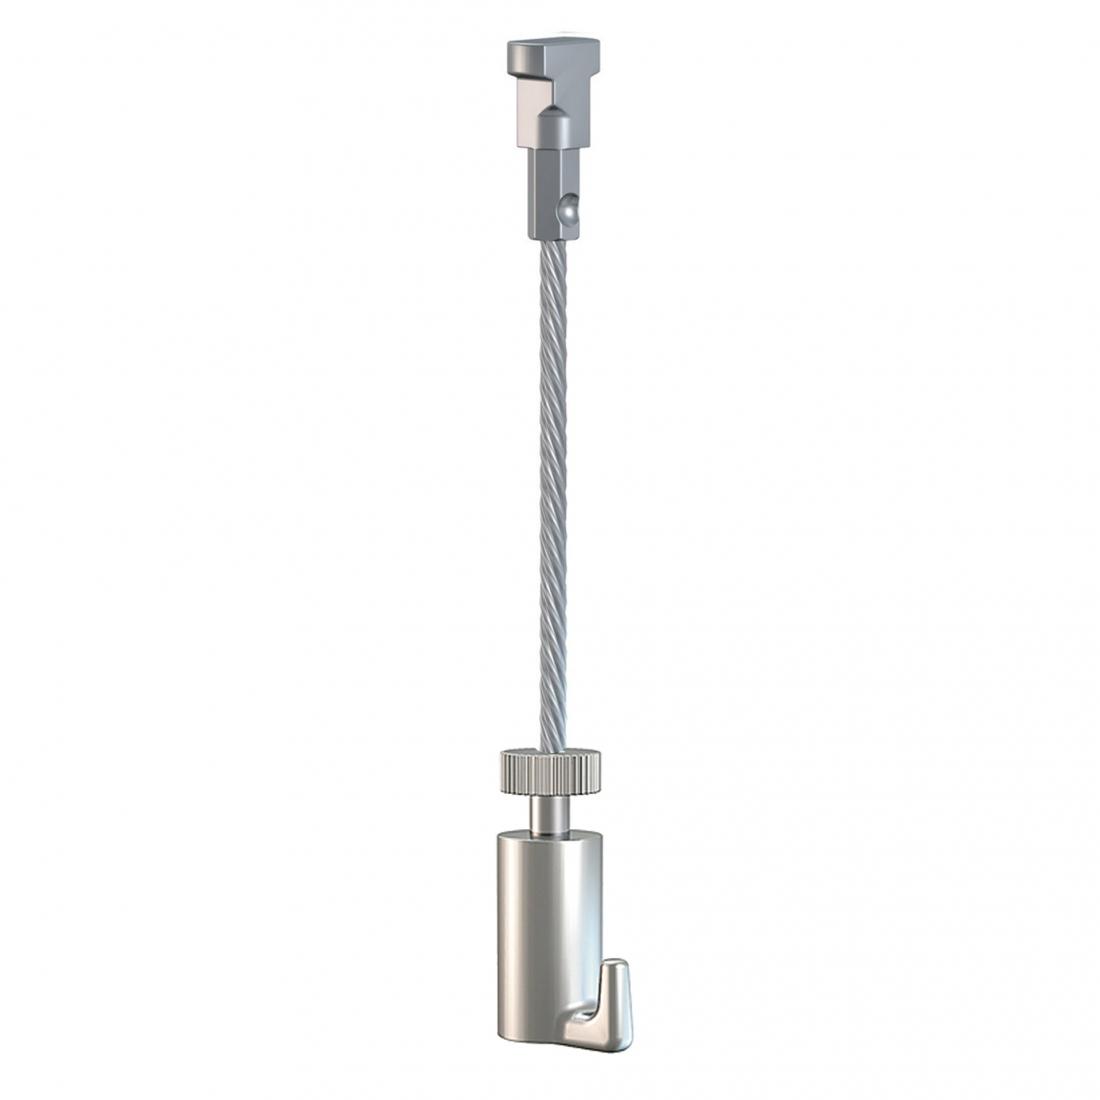 KIT CABLE de ACERO con gancho para colgador para guias para colgar cuadros artiteq, modelo TWISTER de 15 KG